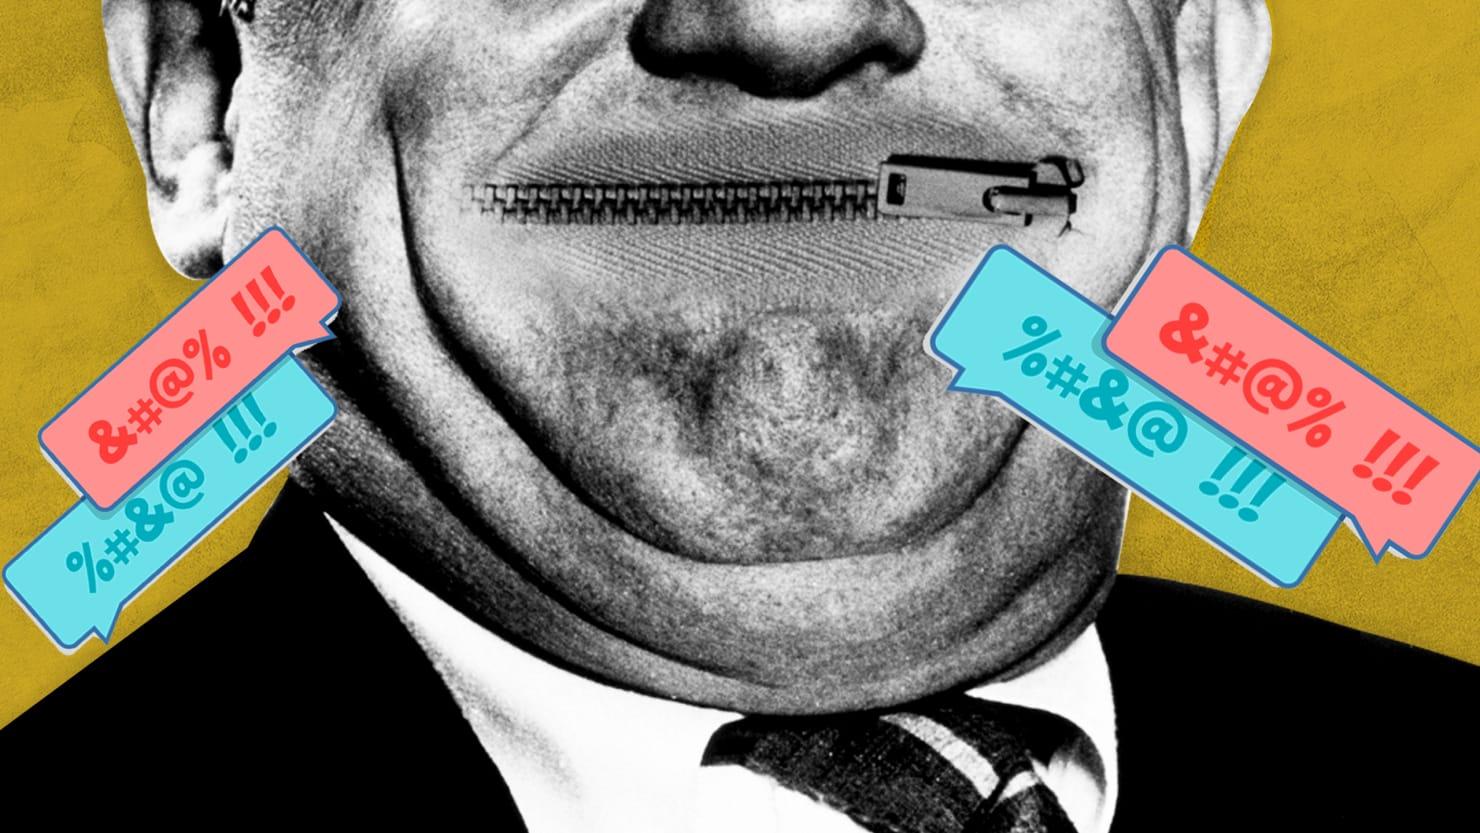 hate speech v free speech  »  8 Image »  Amazing..!